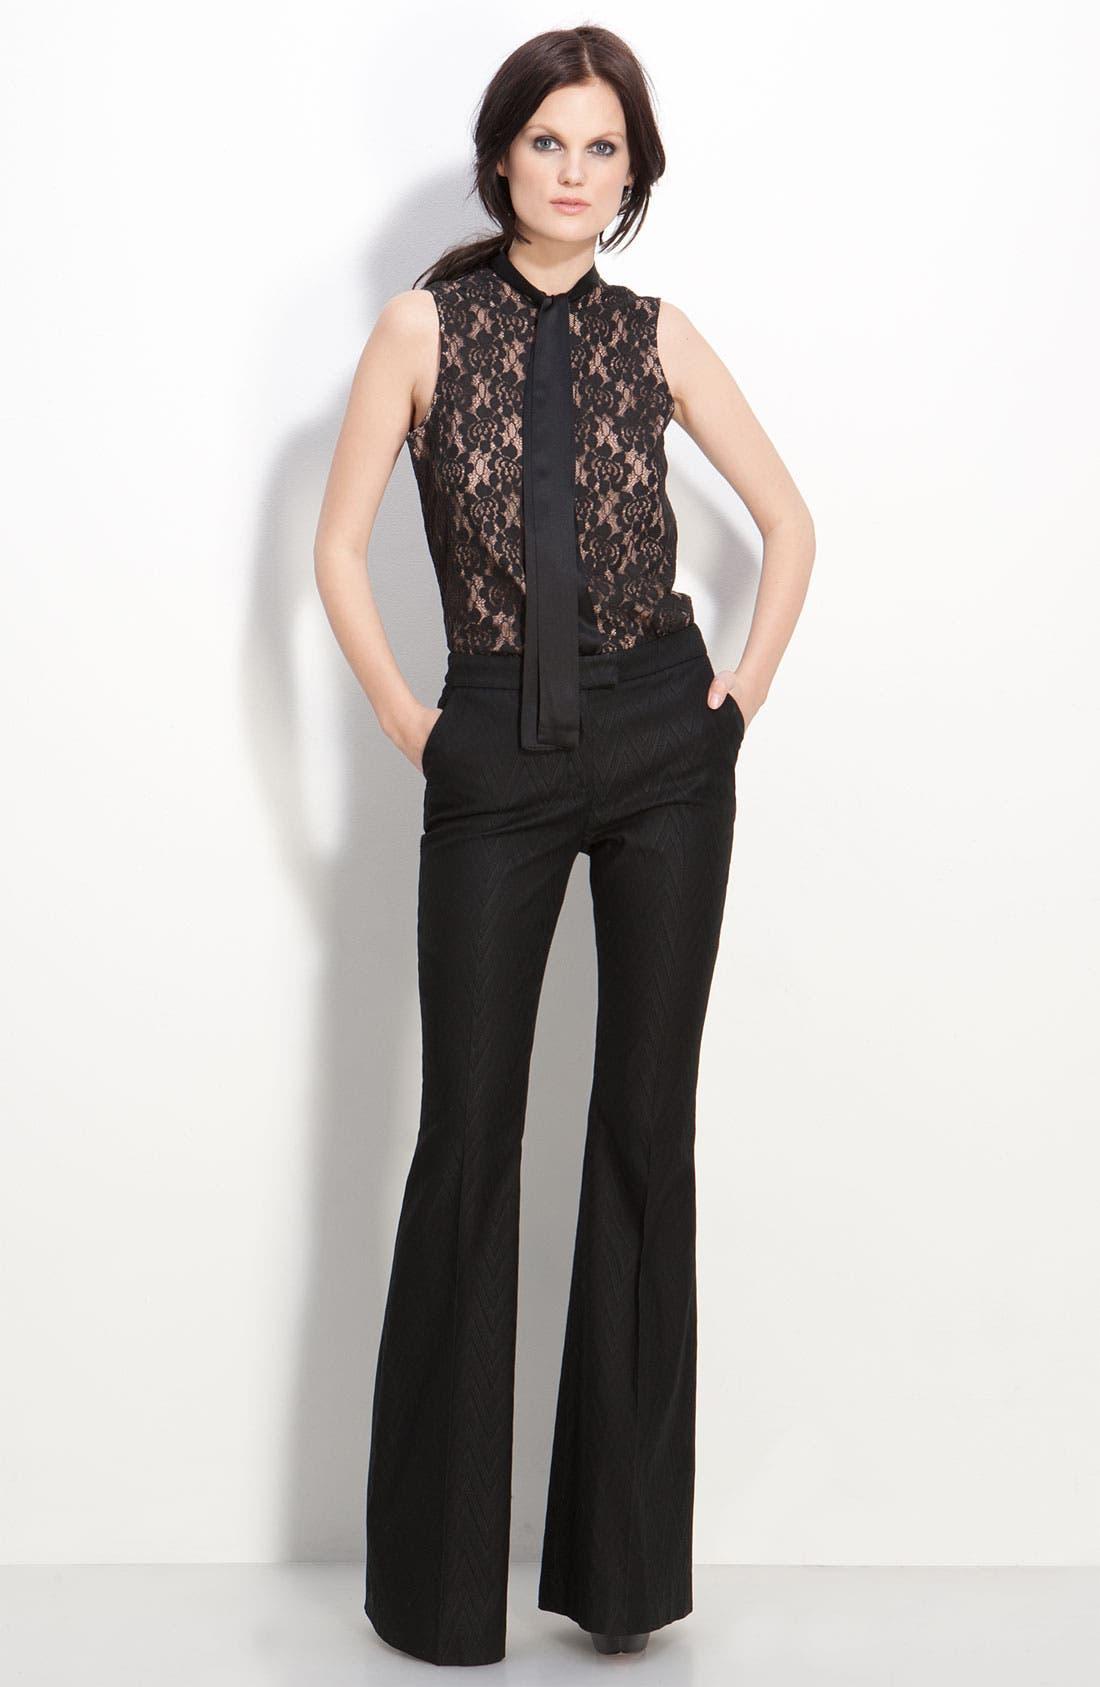 Main Image - Rachel Zoe 'Jessica' Tie Neck Sleeveless Blouse